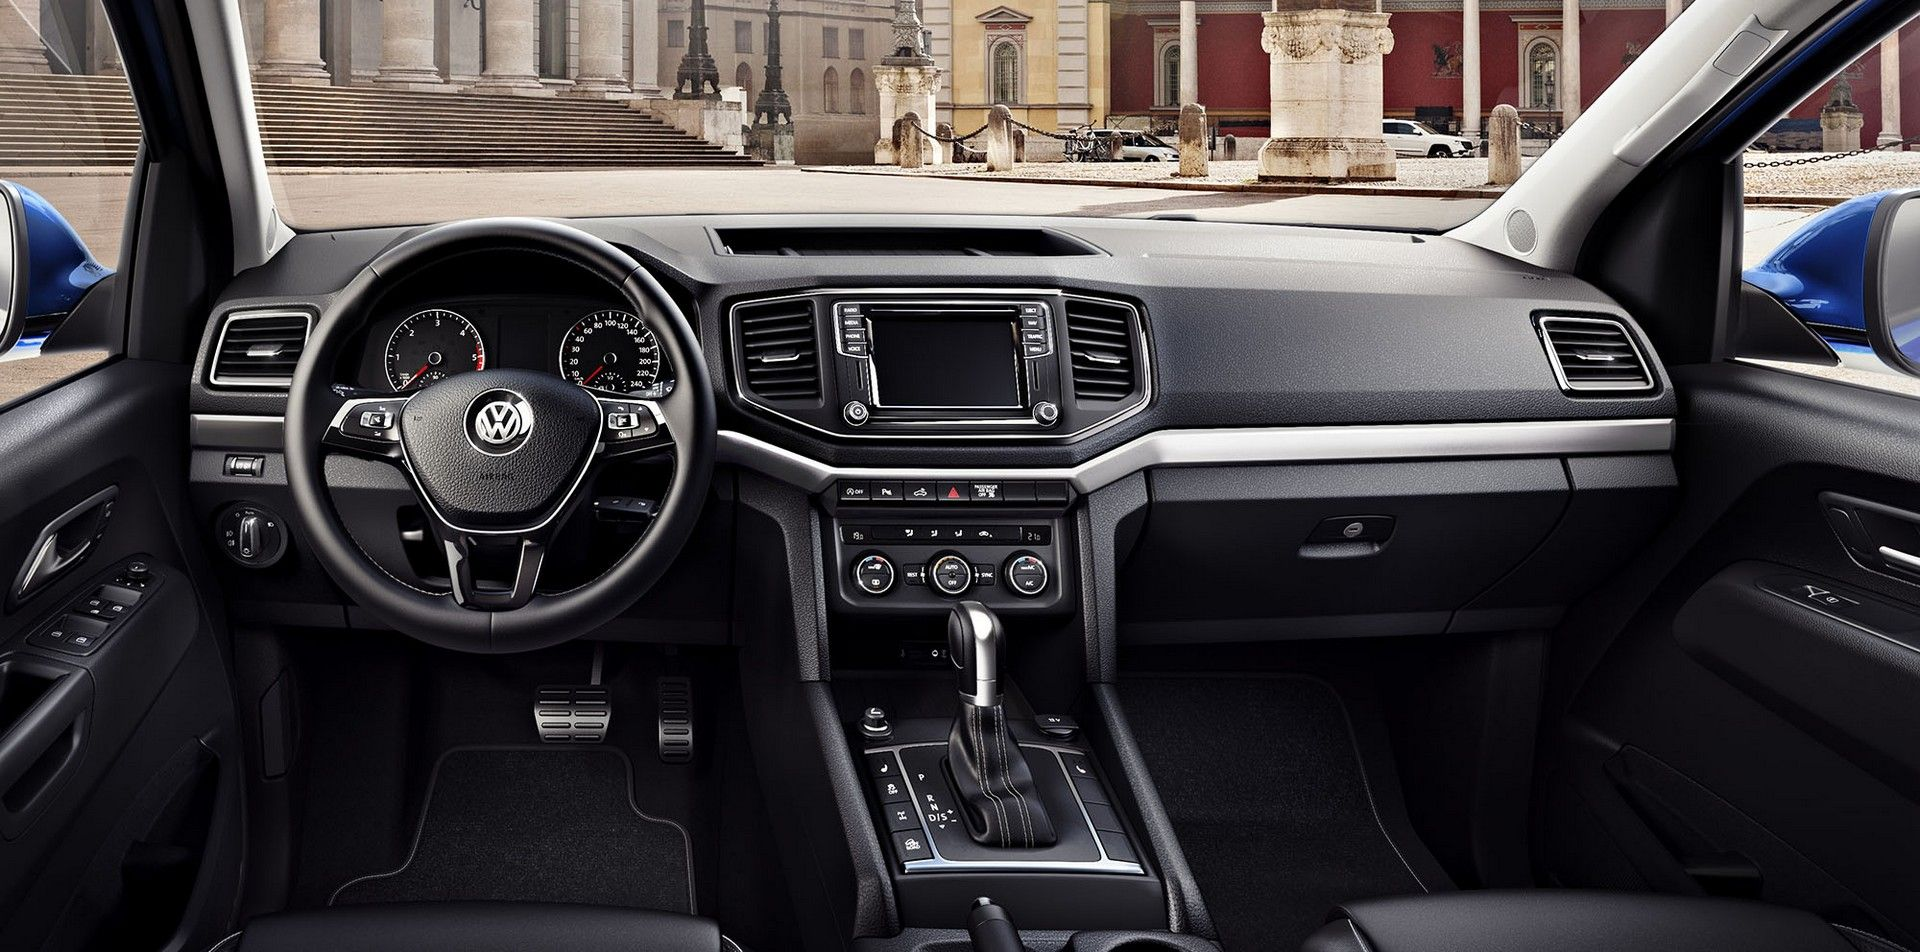 2020 Vw Amarok Interior Pickup Kendaraan